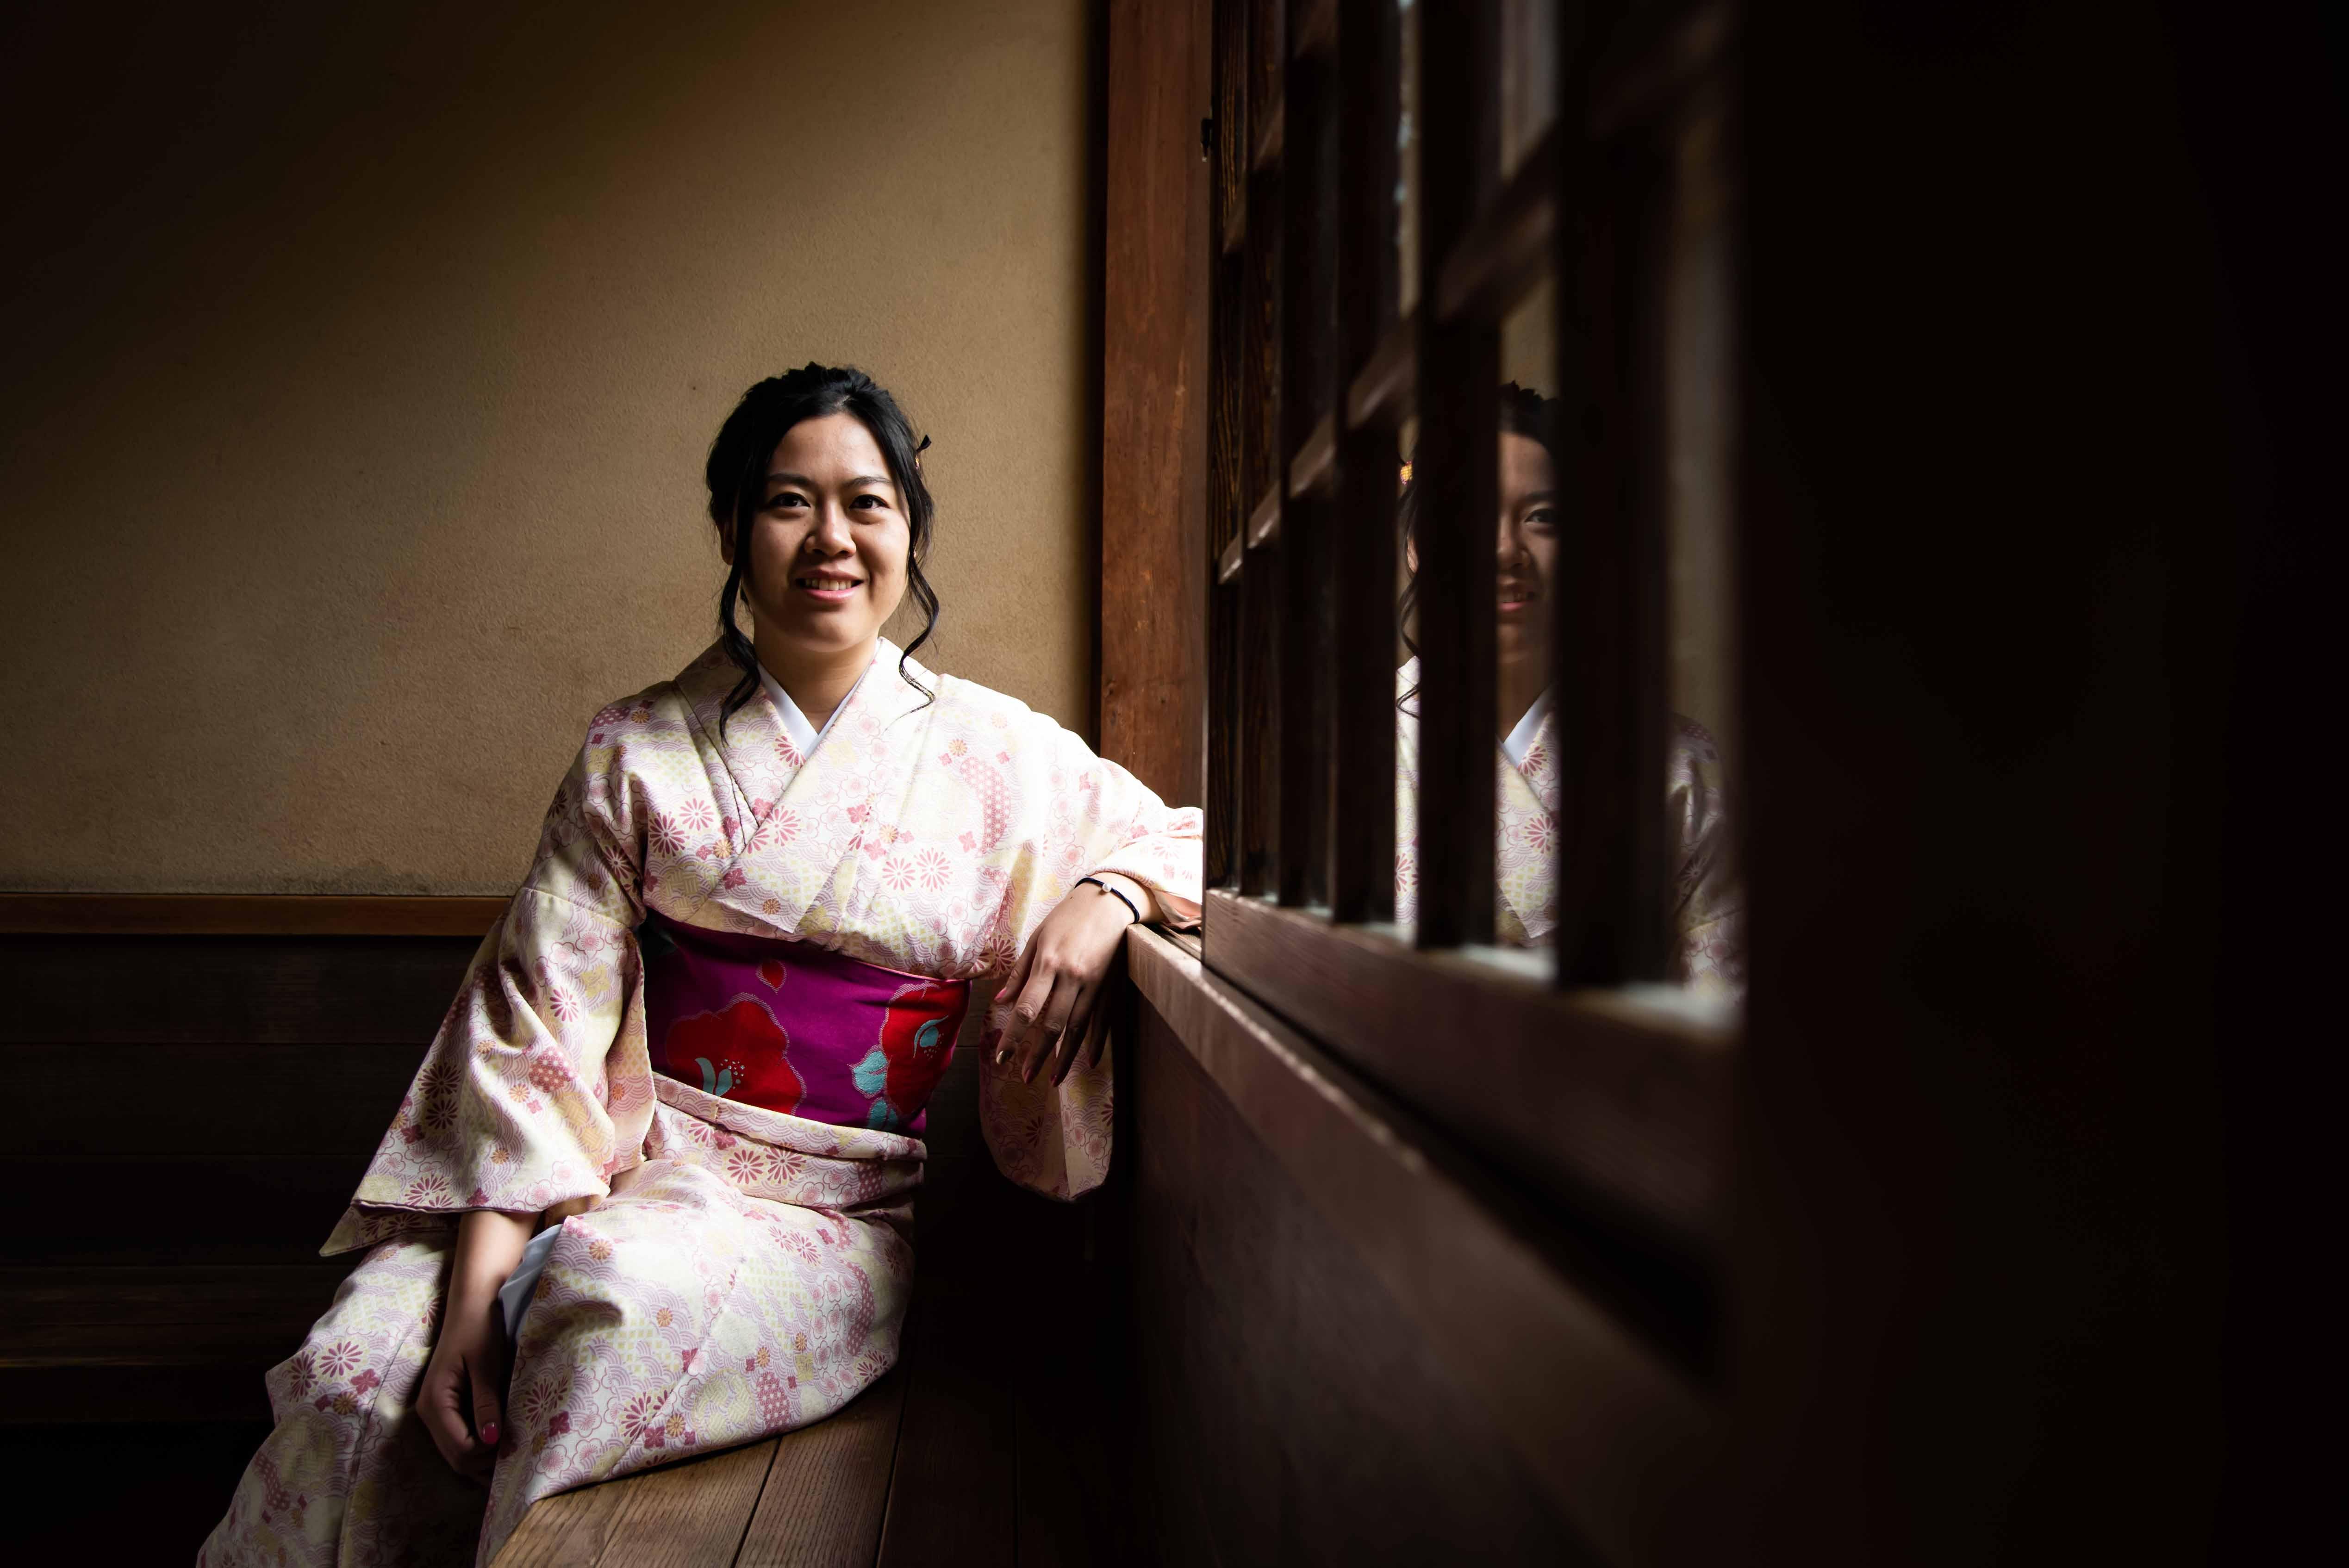 Kimono Photo-shoot